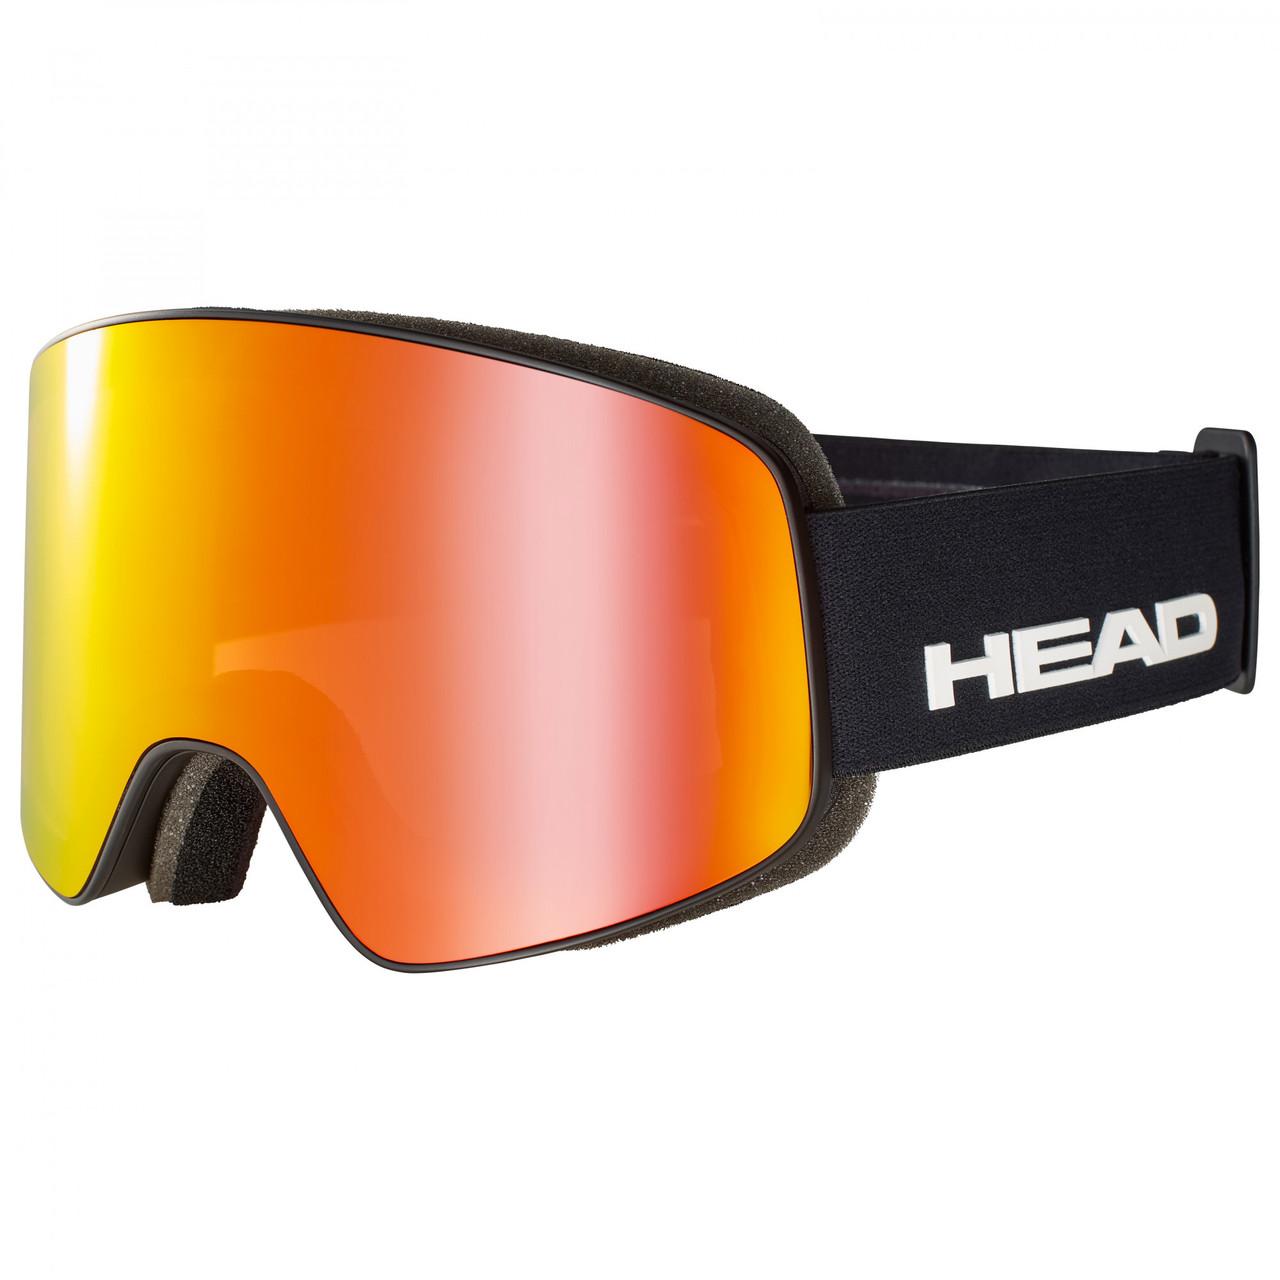 HEAD HORIZON FMR